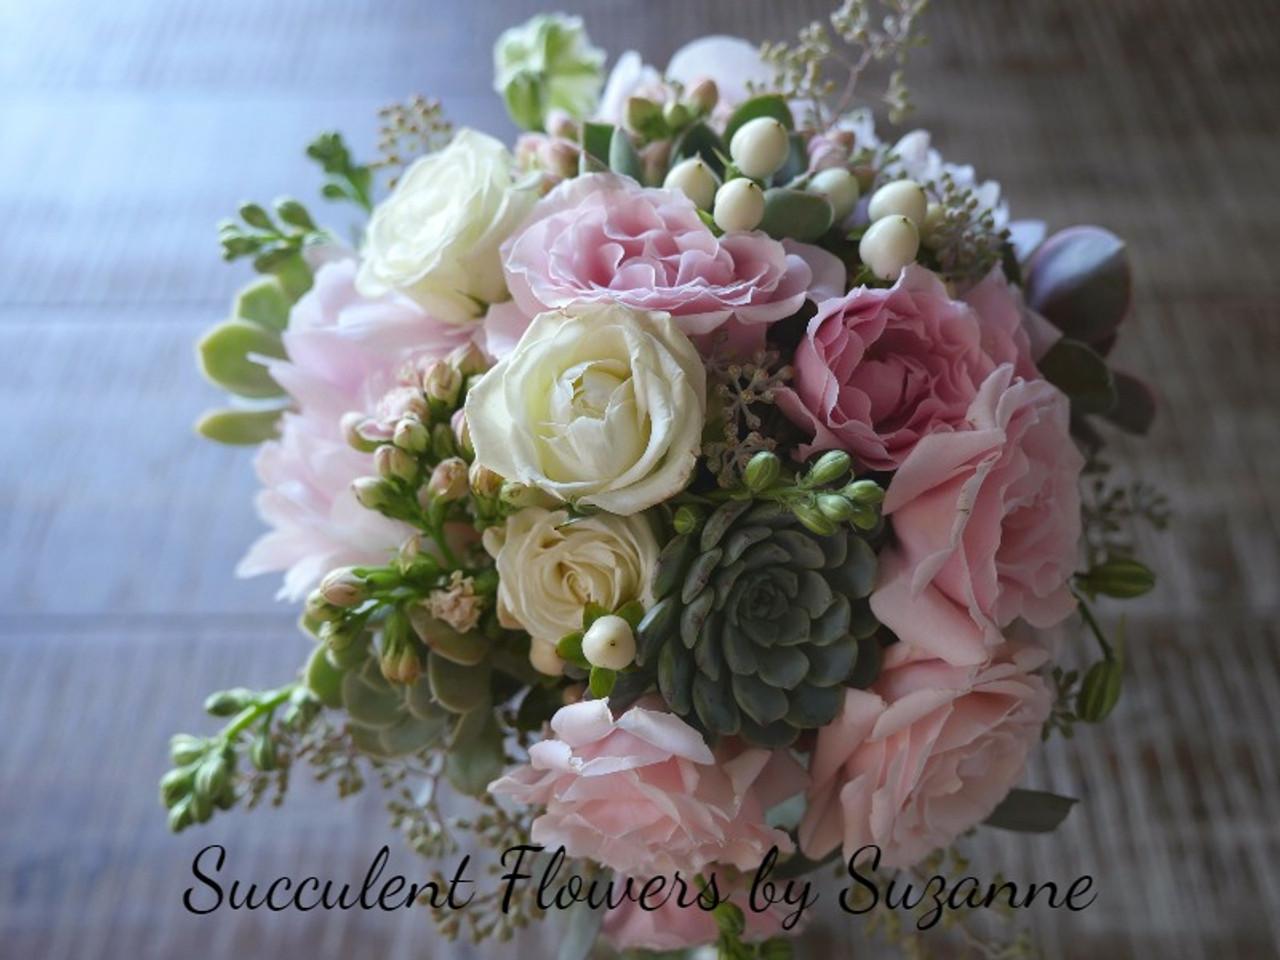 Wedding Succulents And Flower Wedding Bouquet Blush Cactus Limon